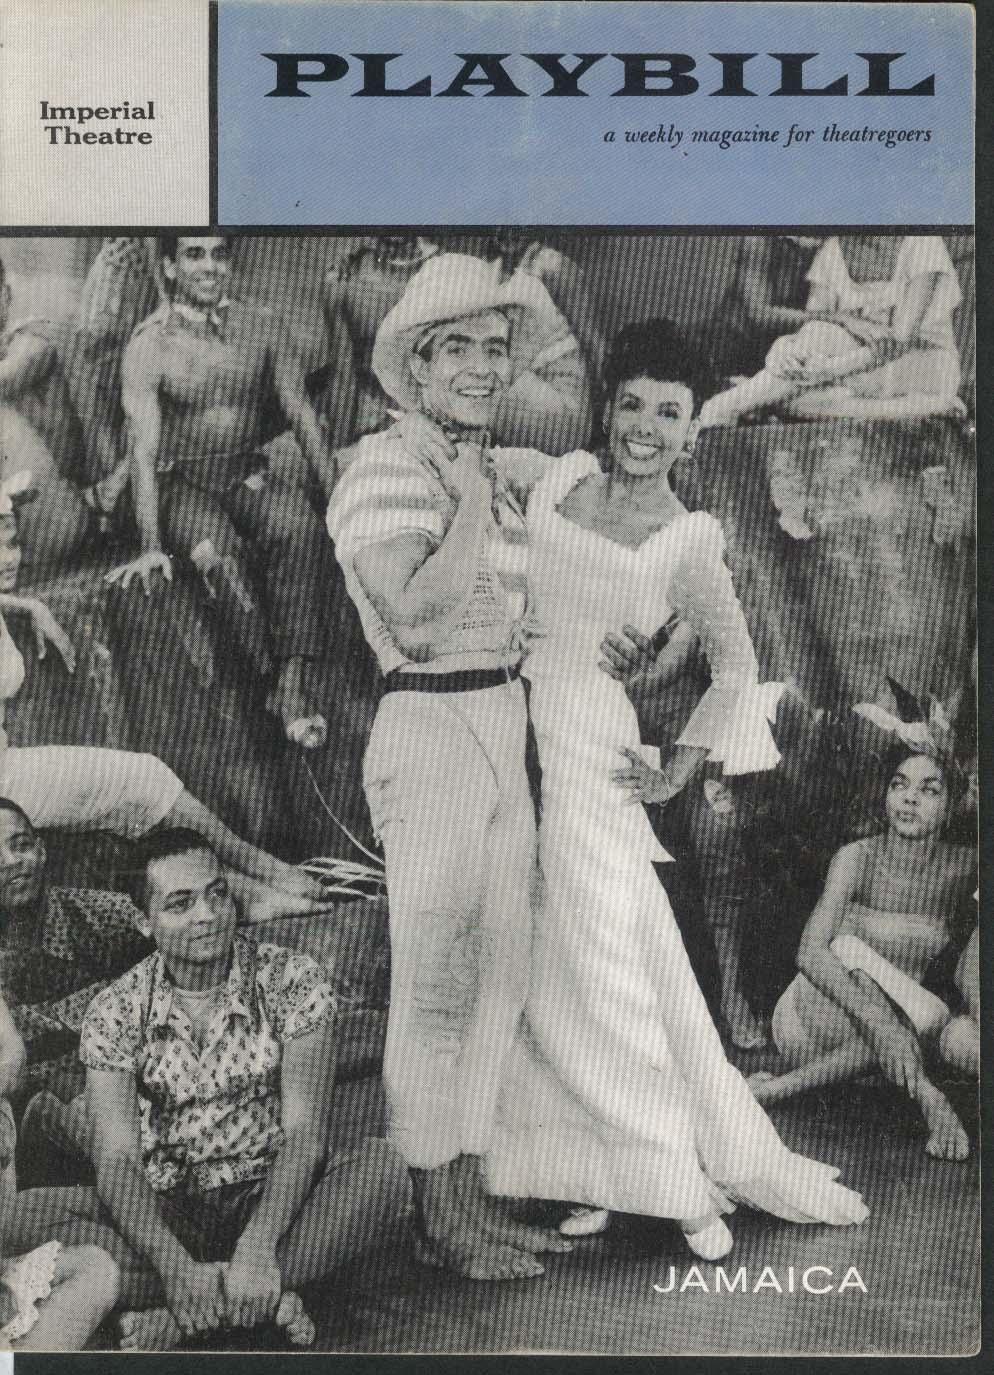 Jamaica Playbill 6/23/58 Lena Horne Ricardo Montalban Imperial Theatre